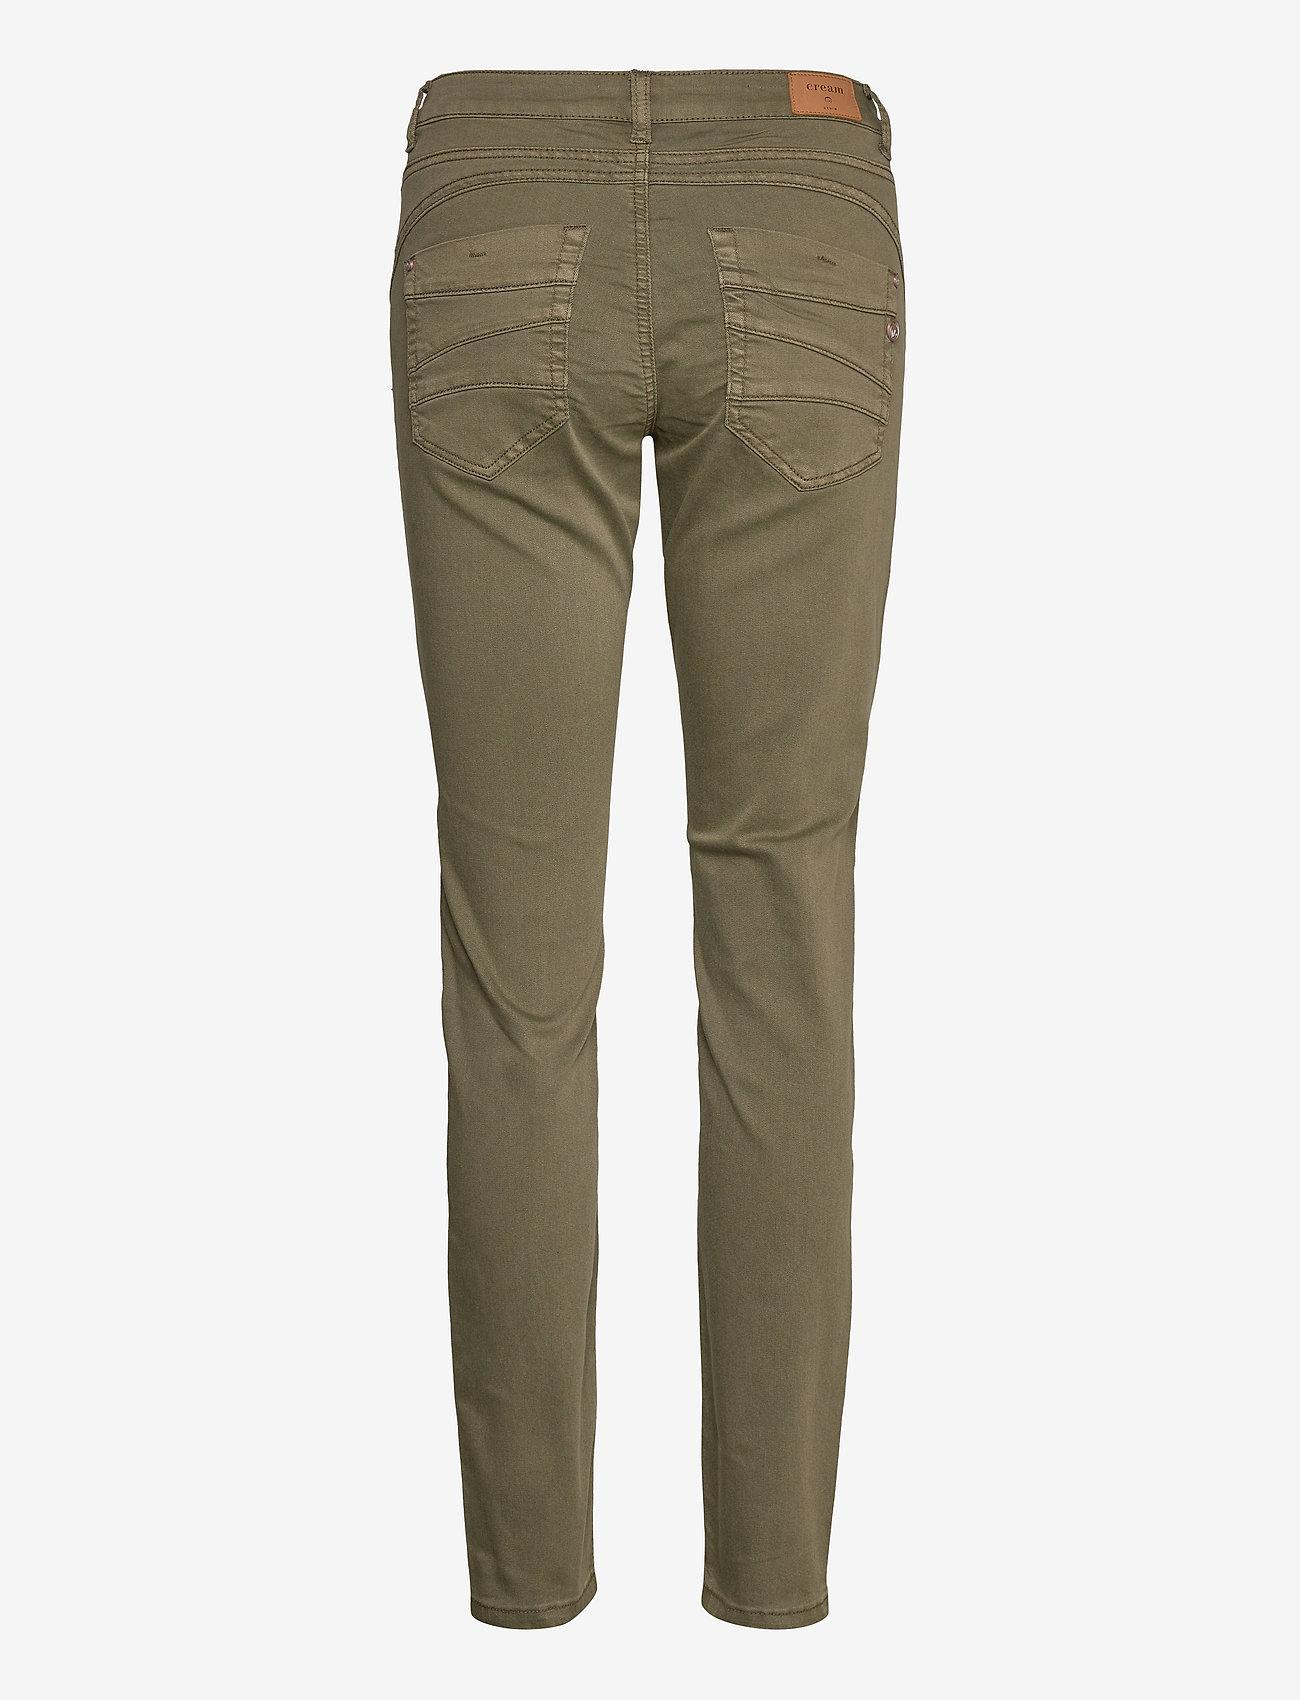 Cream - LotteCR Plain Twill - Coco Fit - skinny jeans - burnt olive - 1